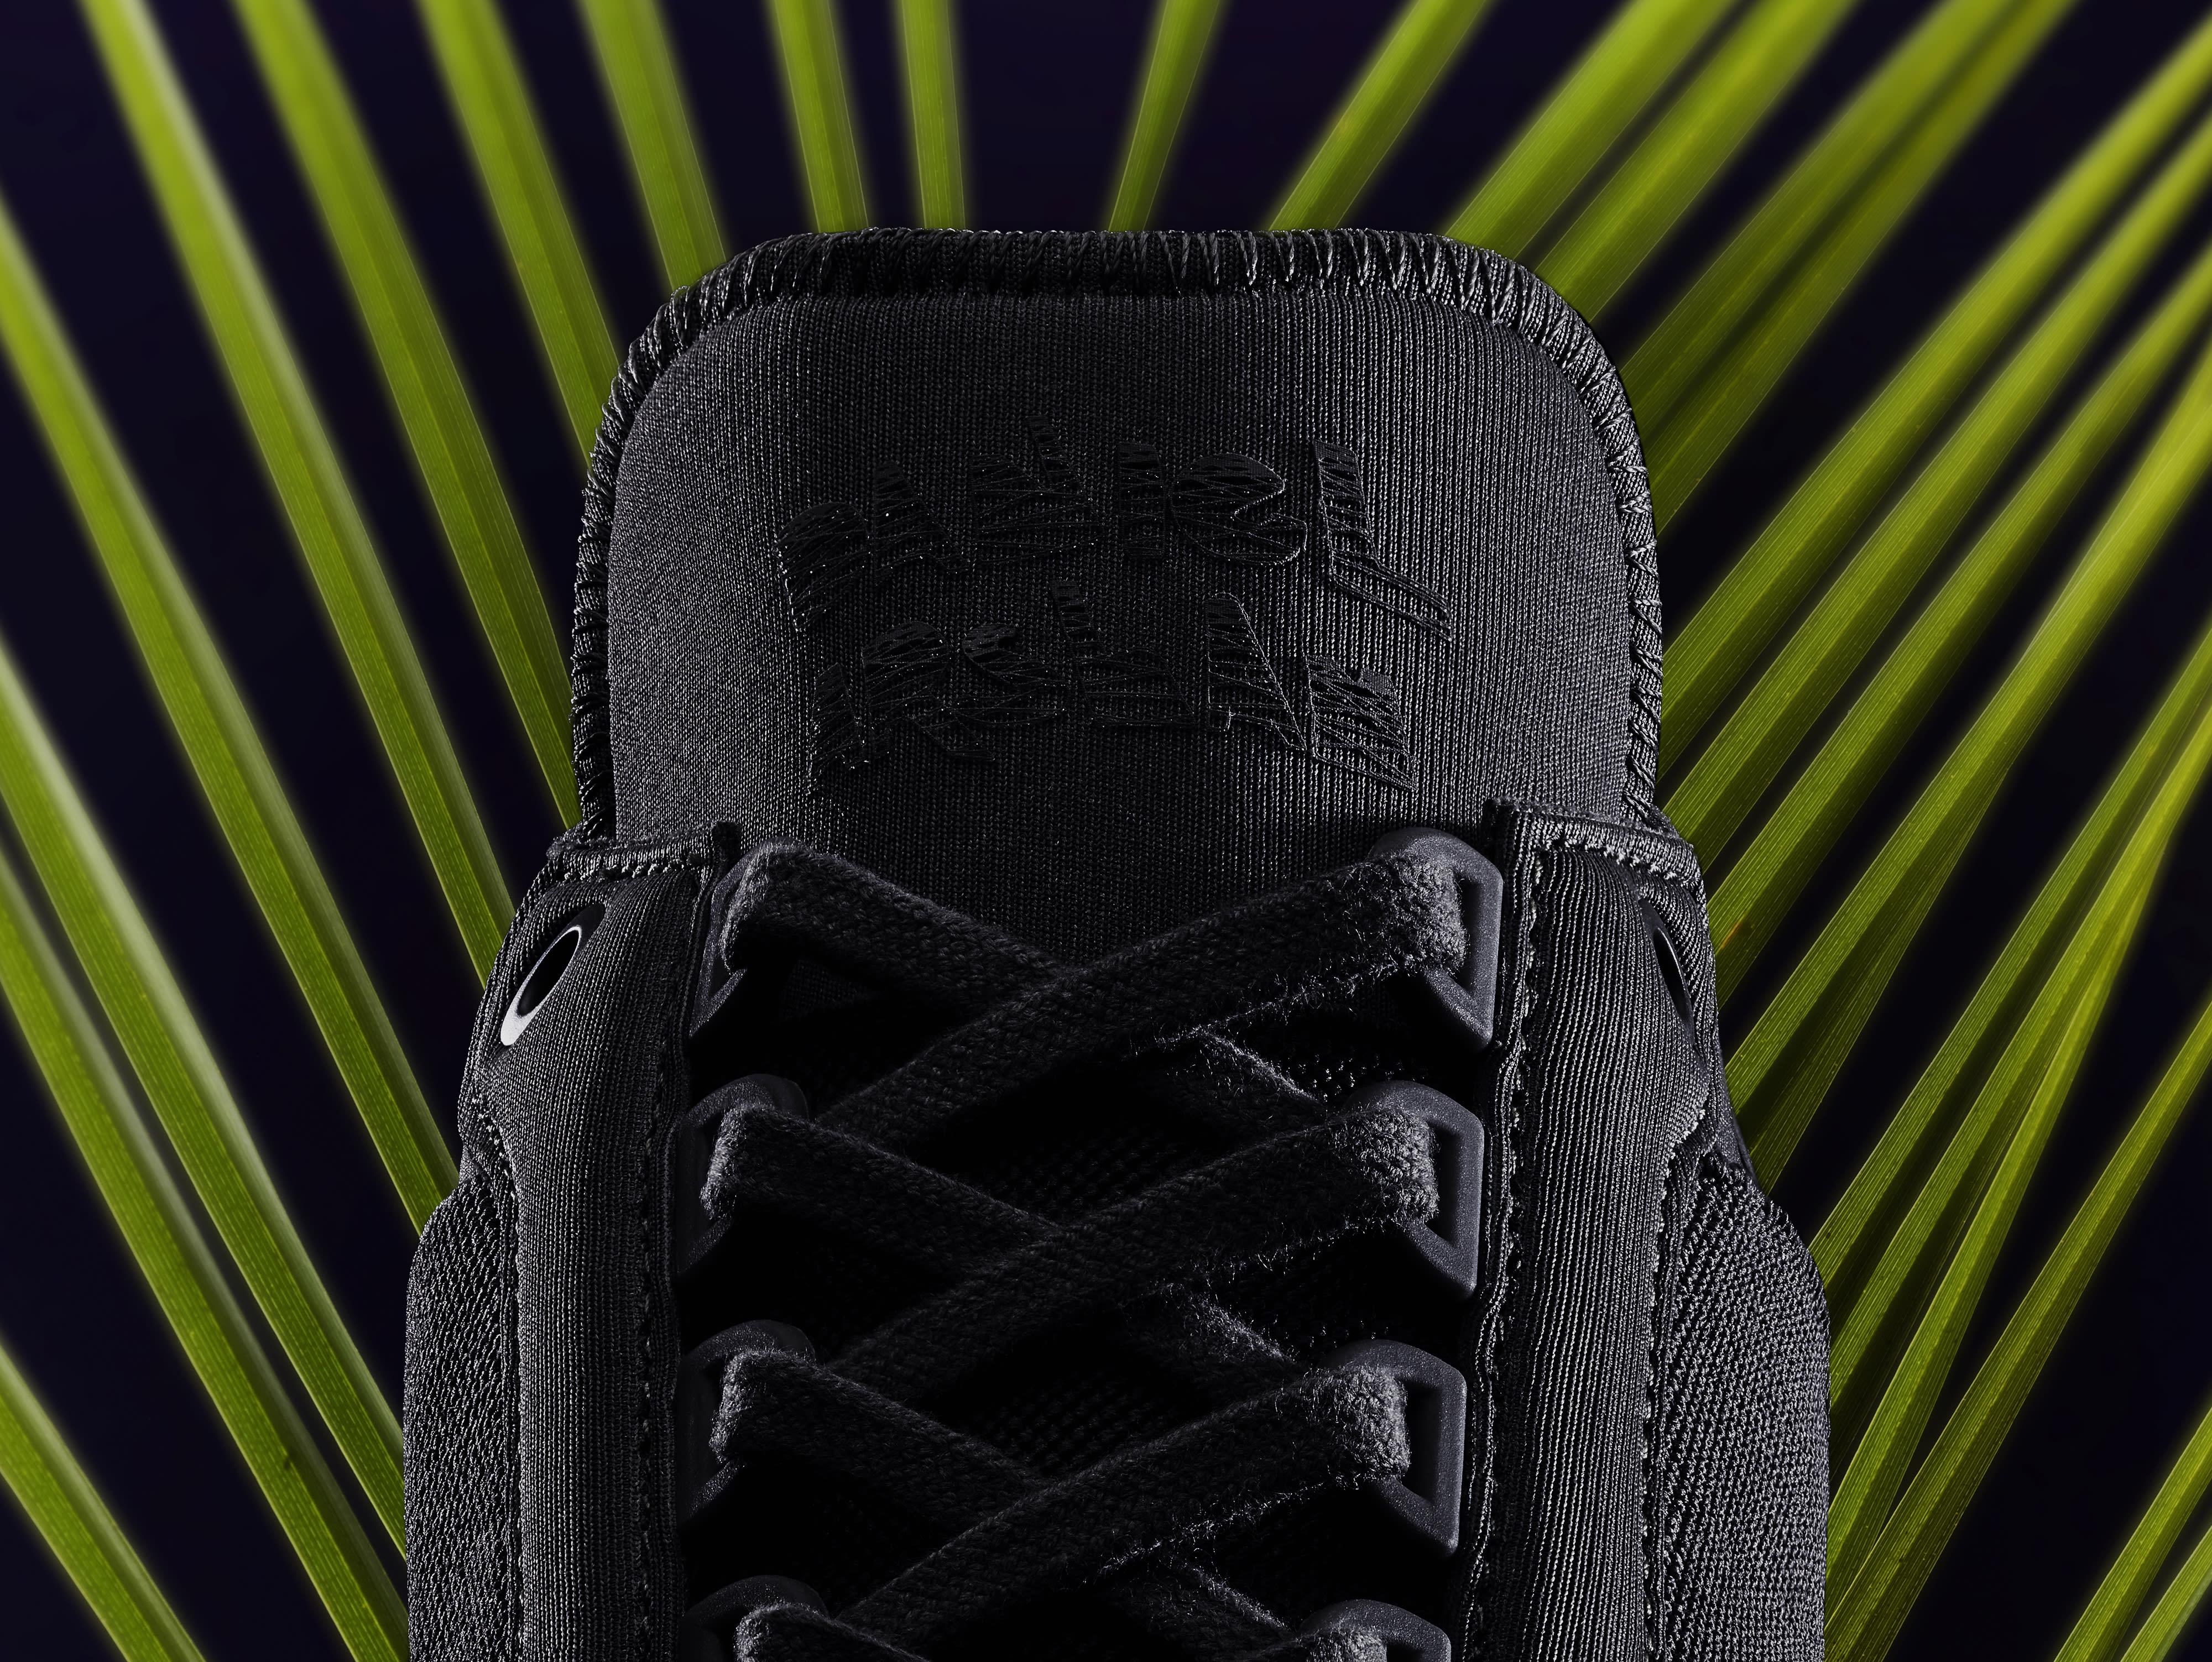 Daniel Arsham x Adidas New York Present DB1971 (Tongue)